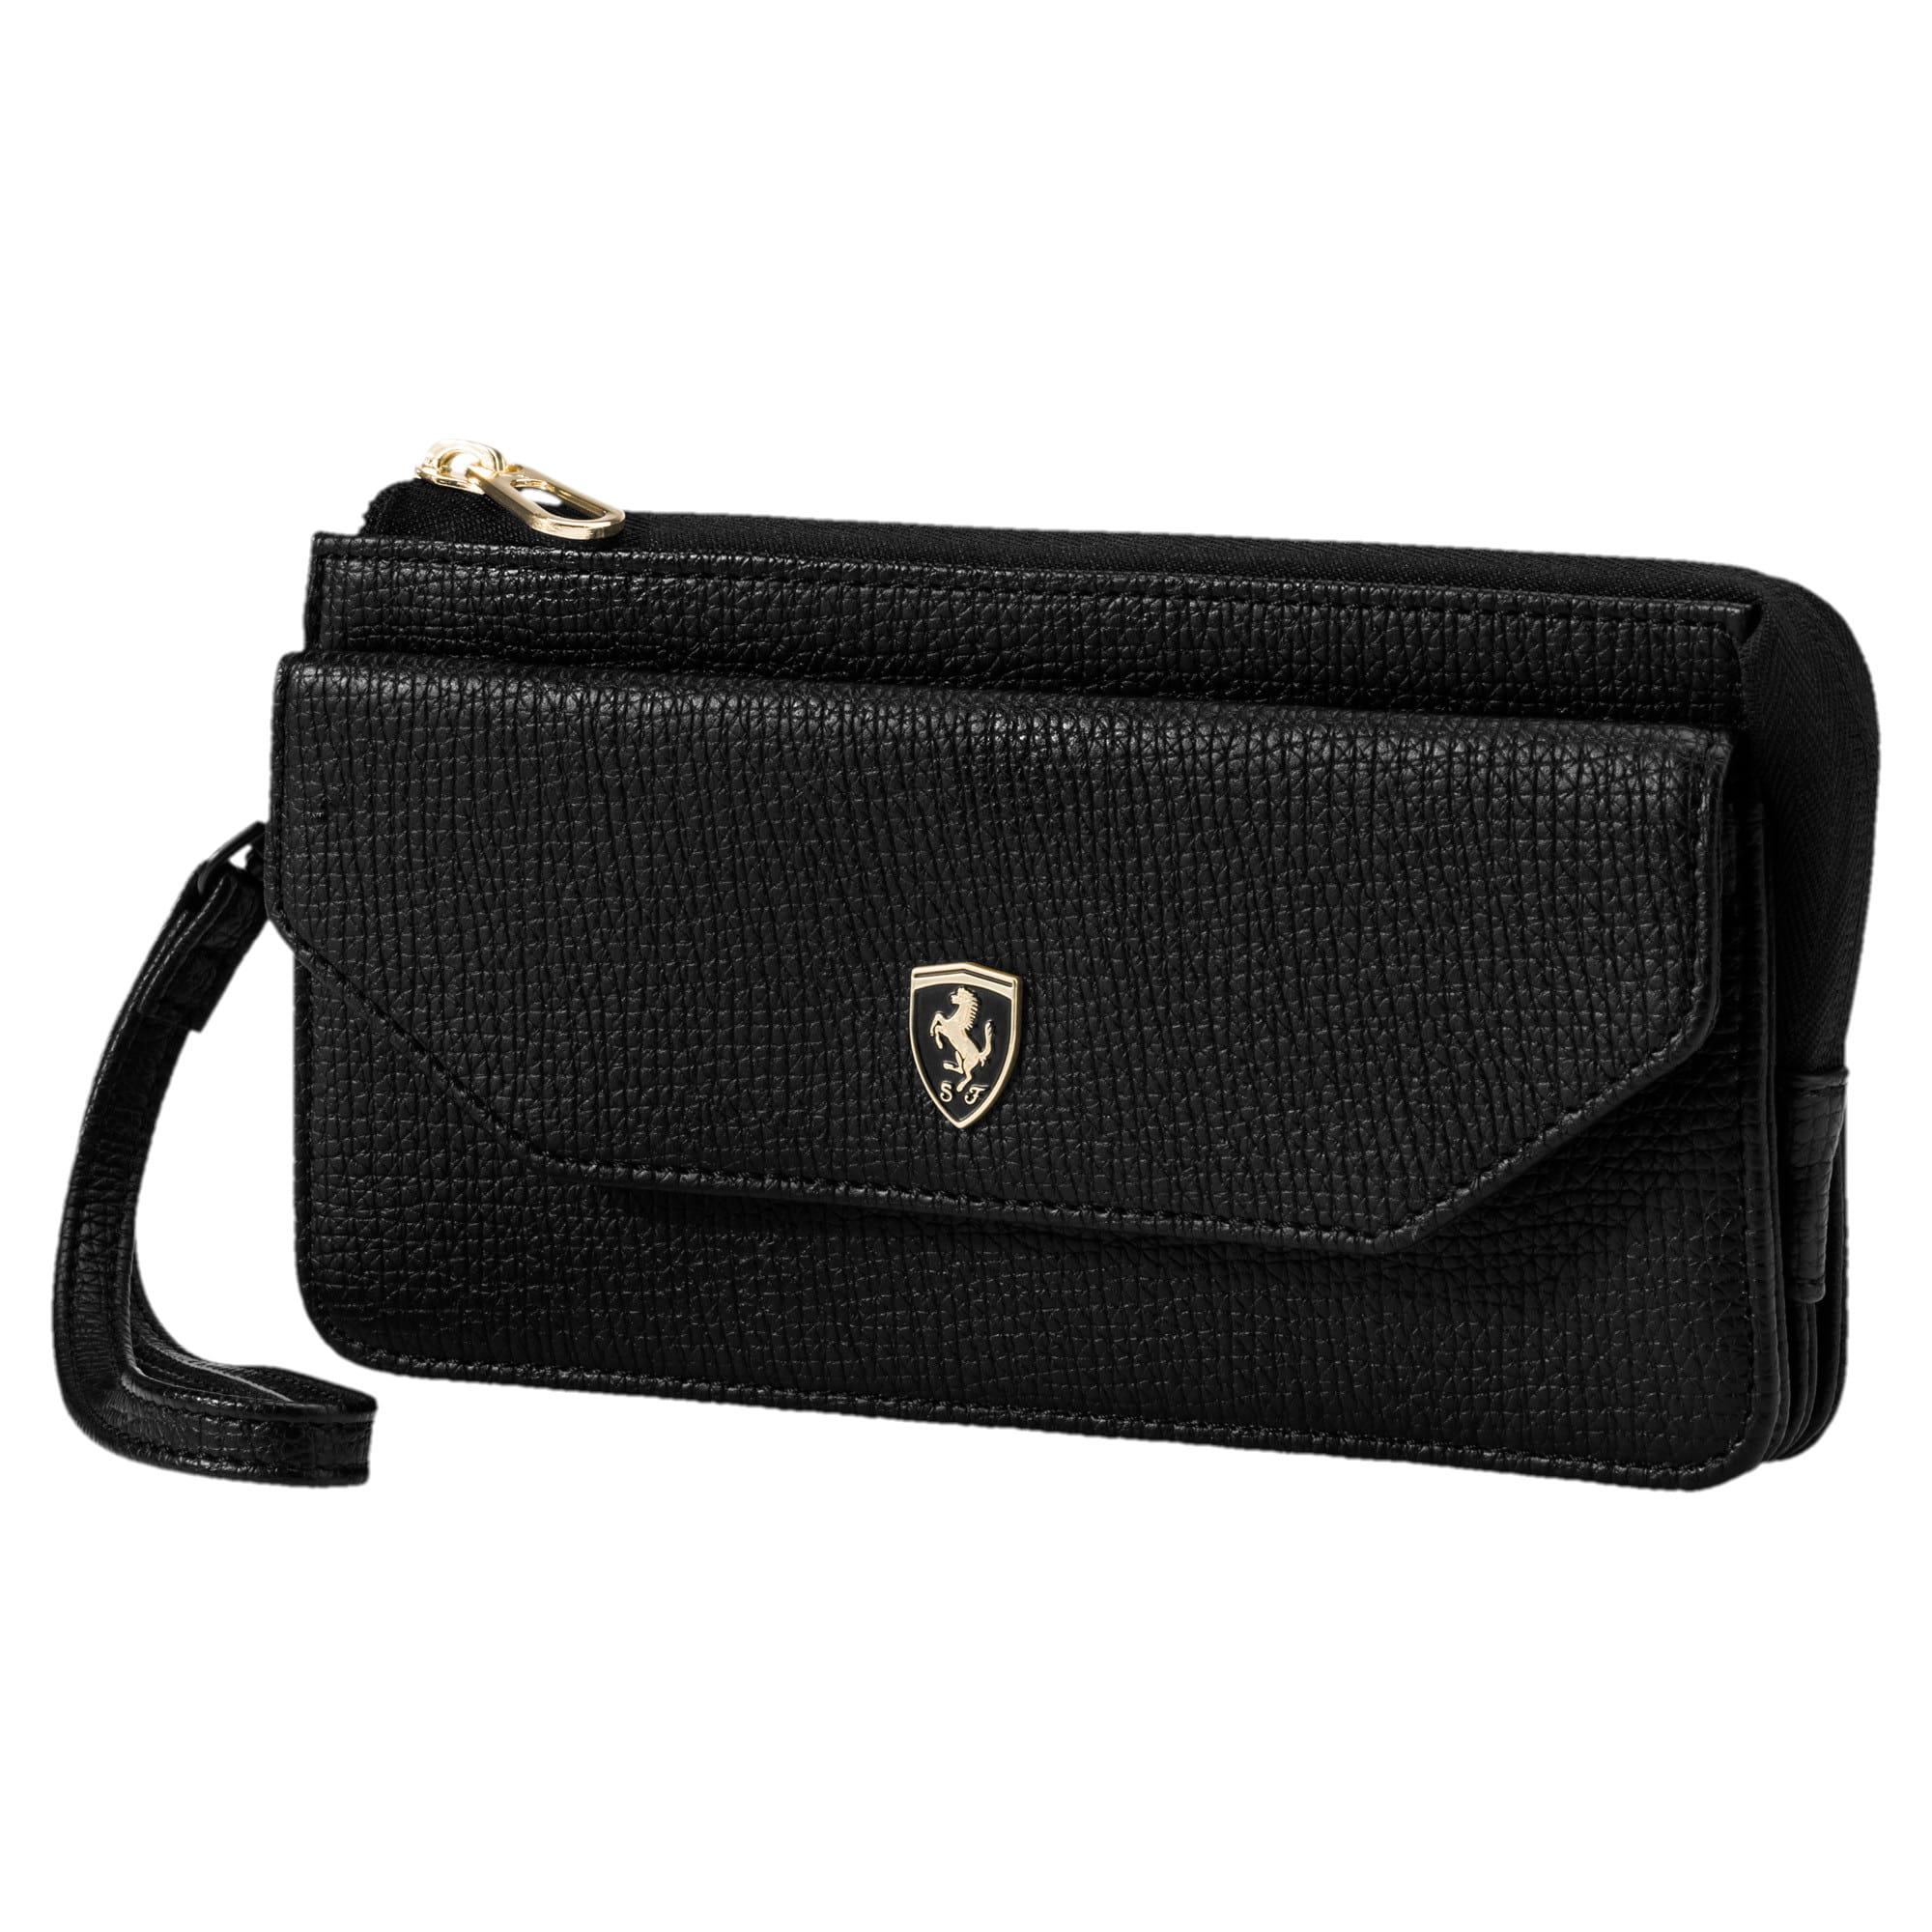 Anteprima 1 di Ferrari Lifestyle Women's Wallet, Puma Black, medio